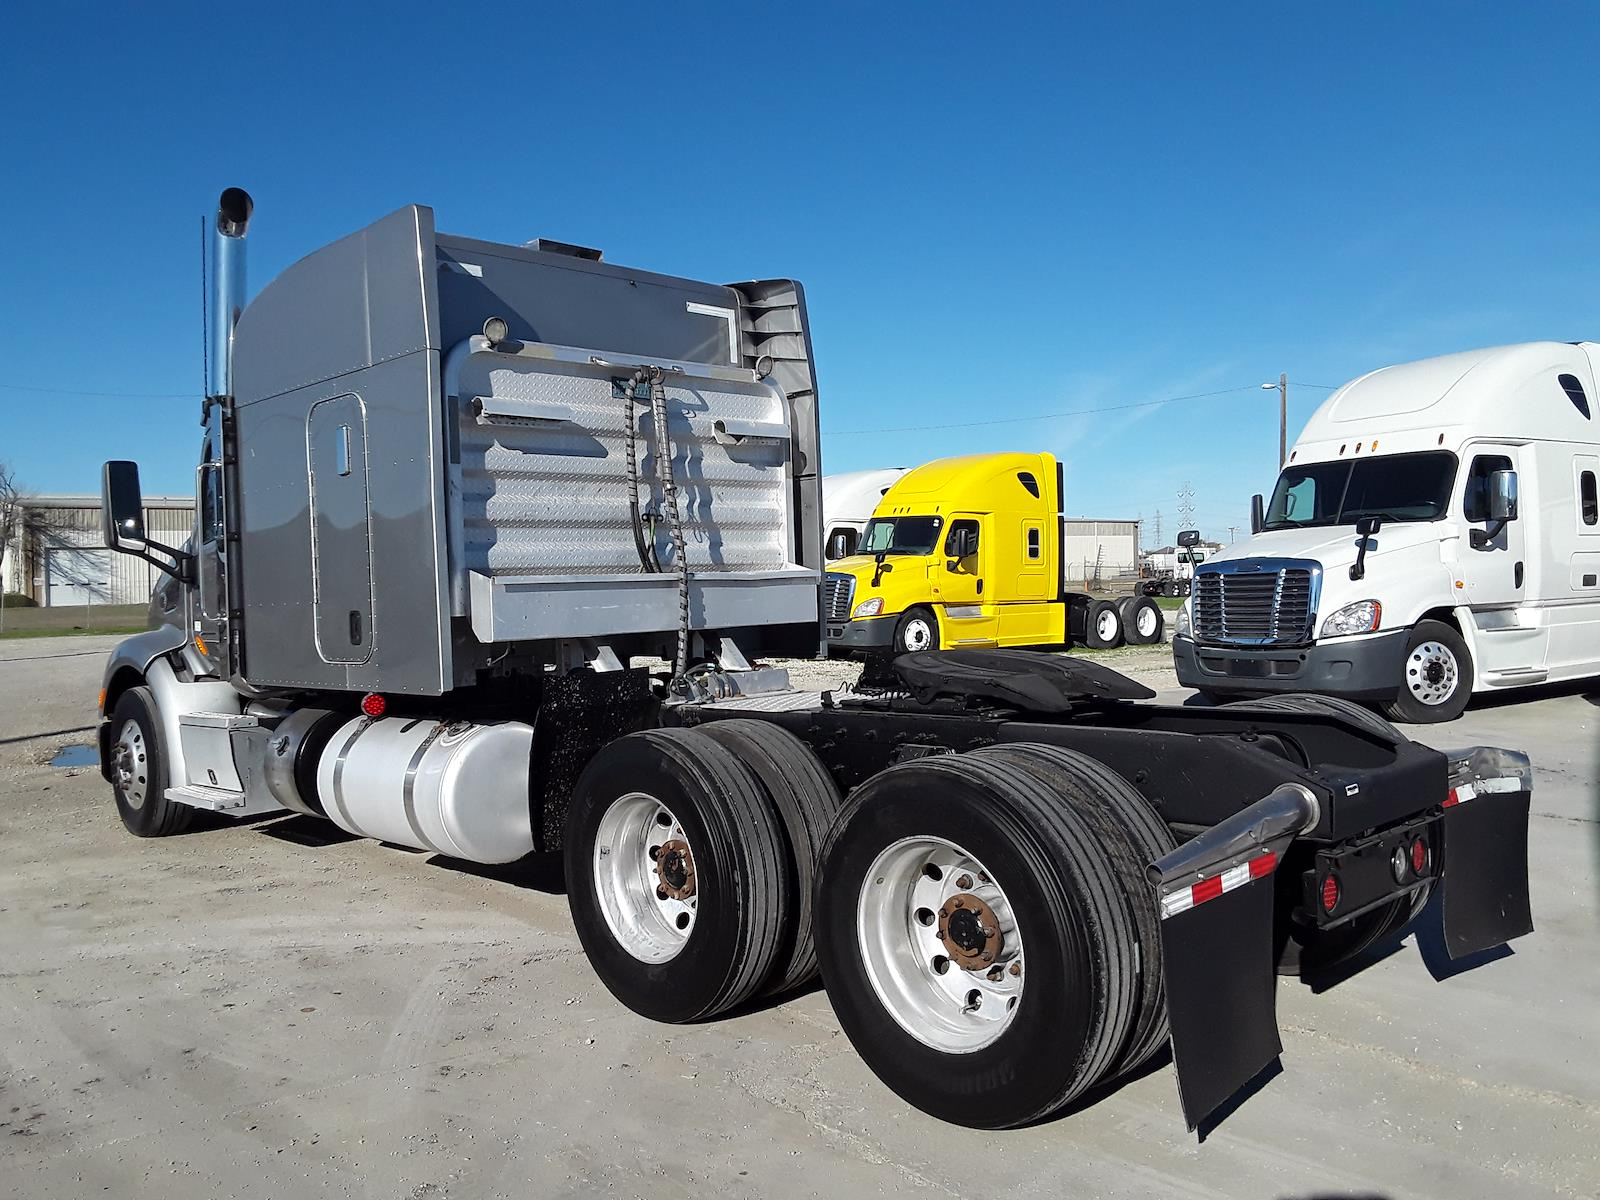 2016 Peterbilt Truck 6x4, Tractor #657521 - photo 1